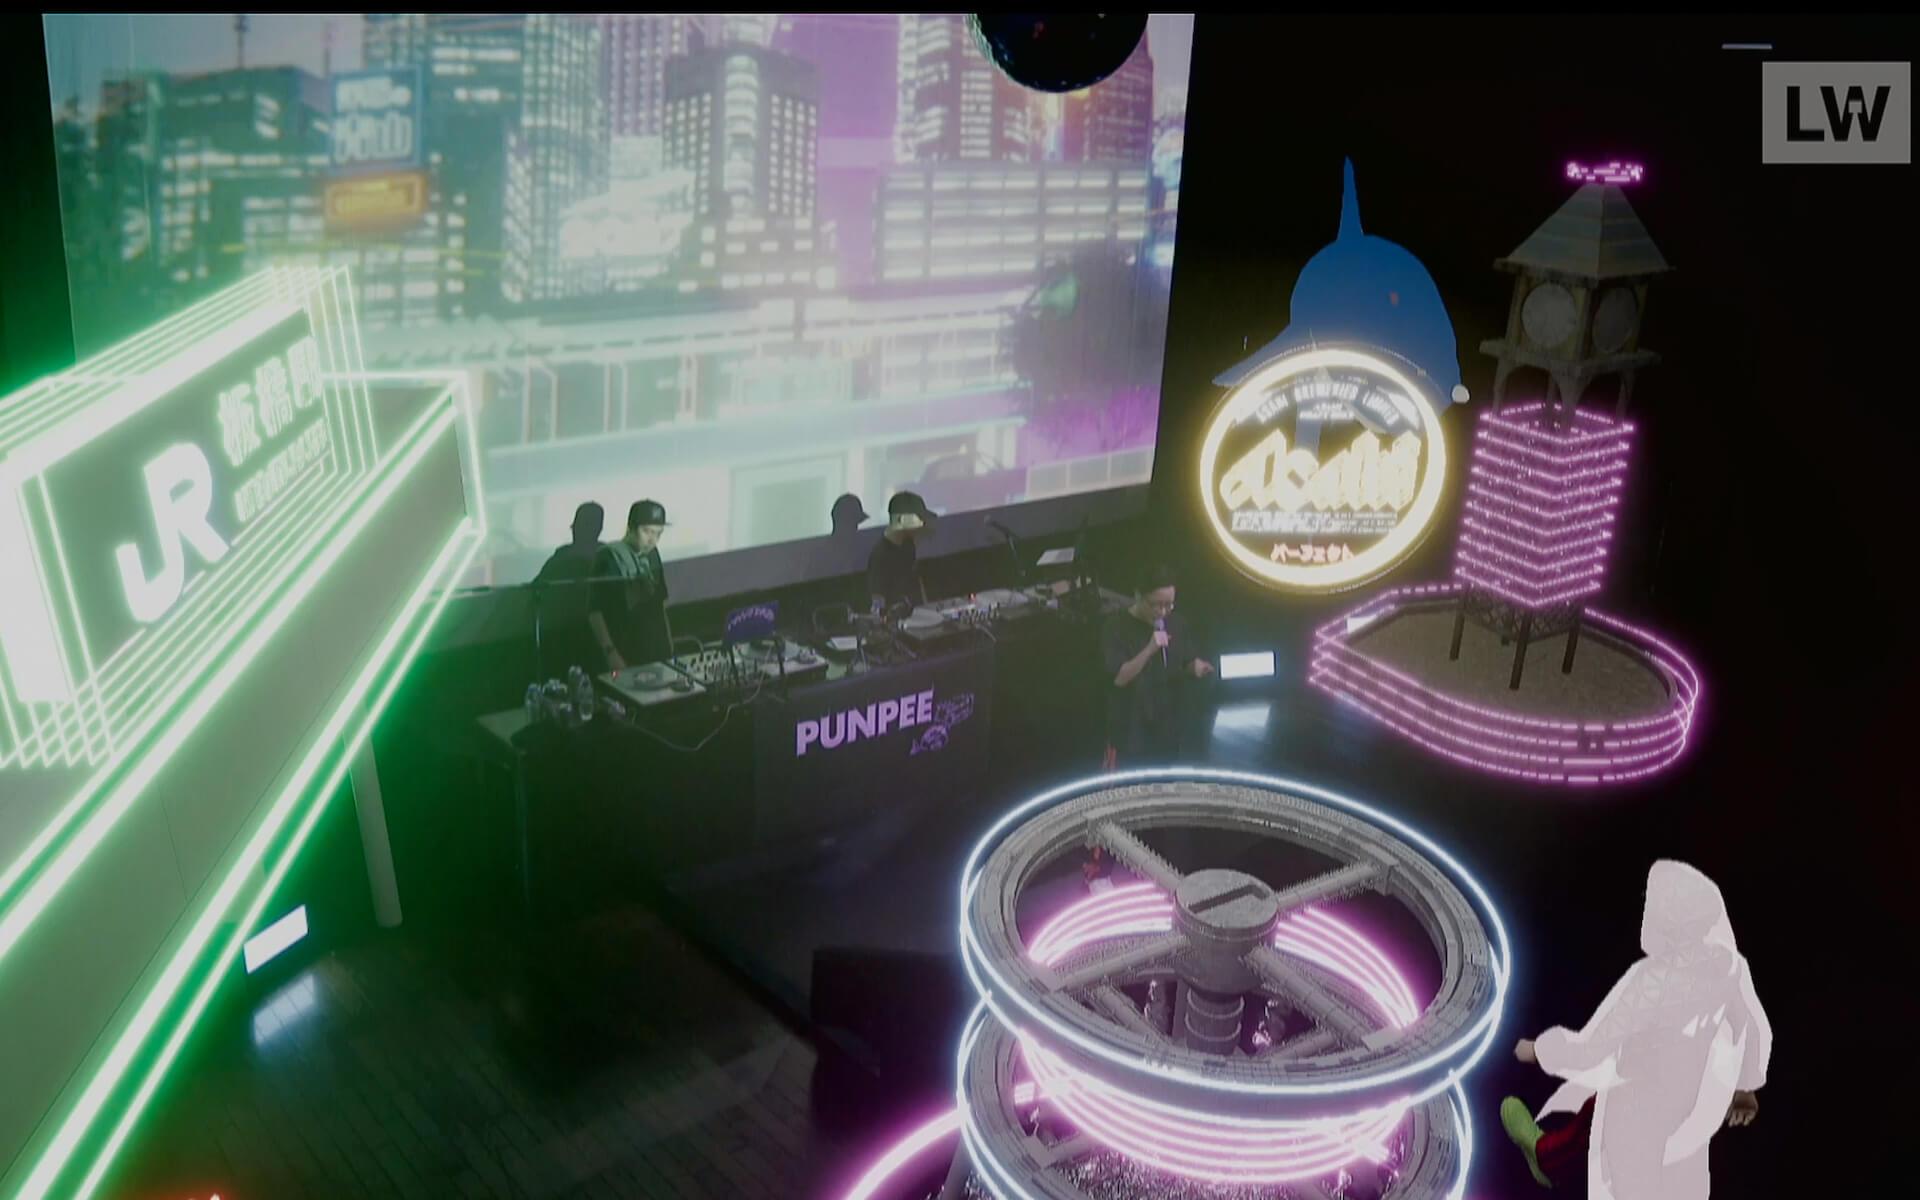 LIVEWIRE PUNPEE<Sofa Kingdomcome>のイースターエッグを一挙紹介! by みやーんZZ music200918_punpee_livewire_14